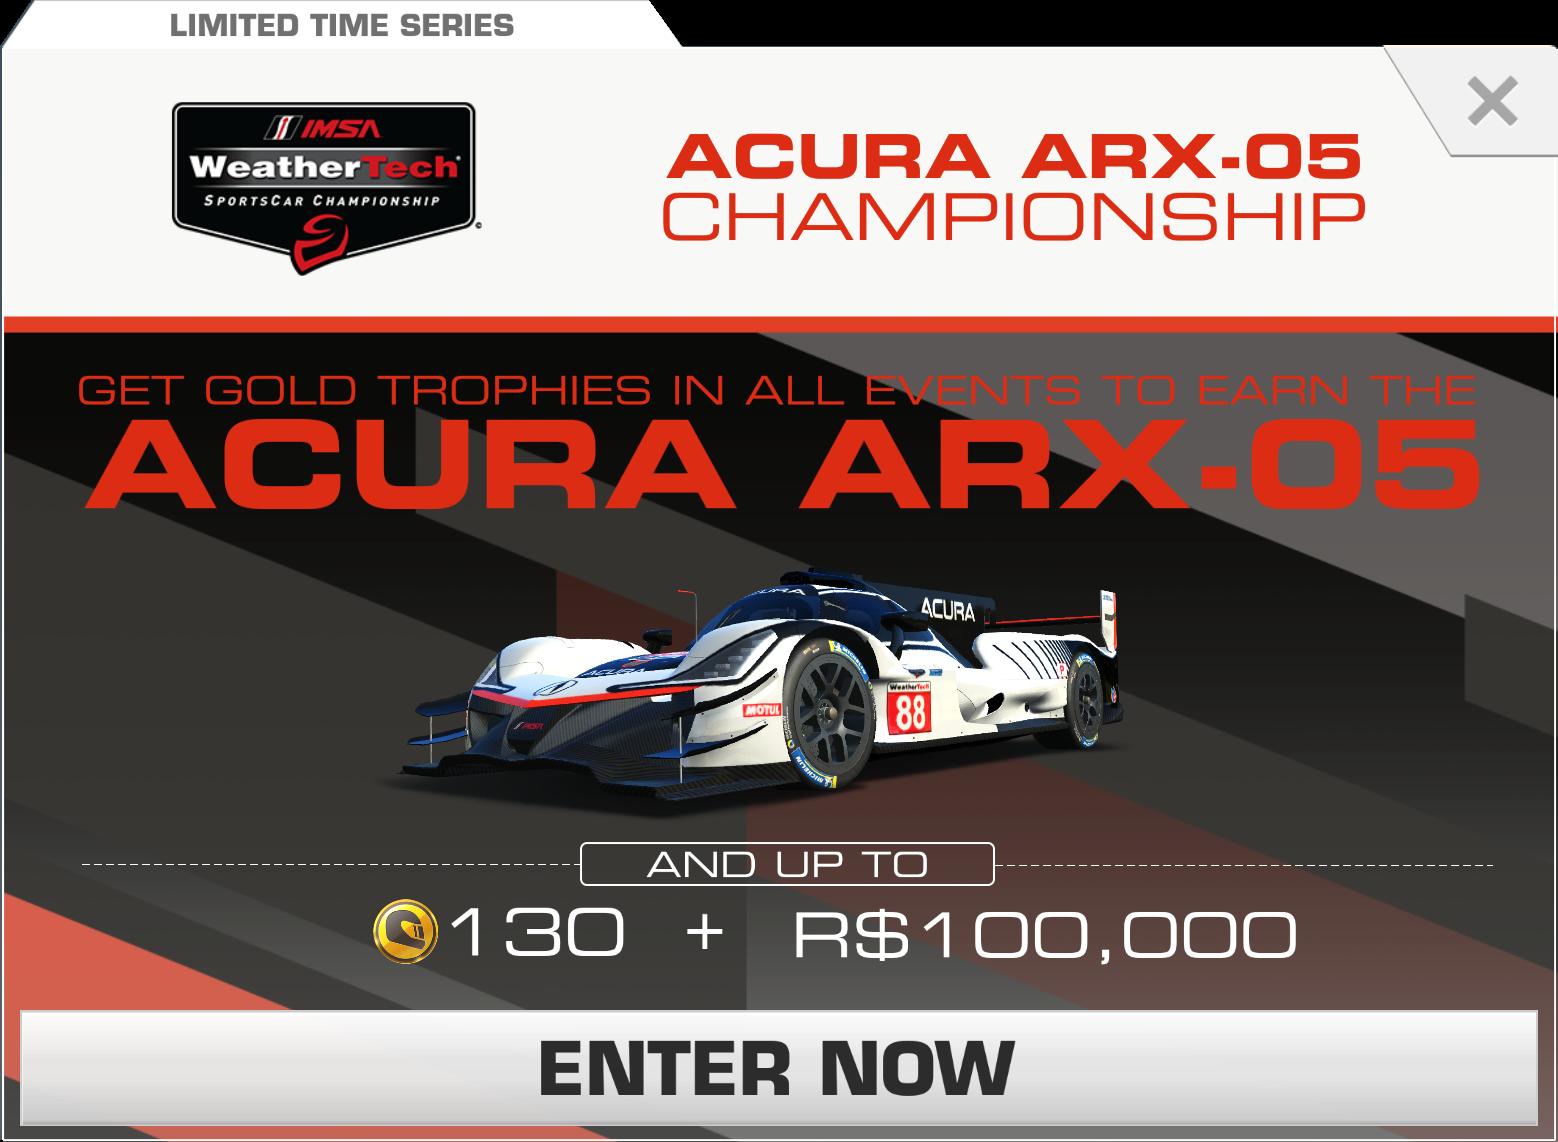 Acura arx 05 championship